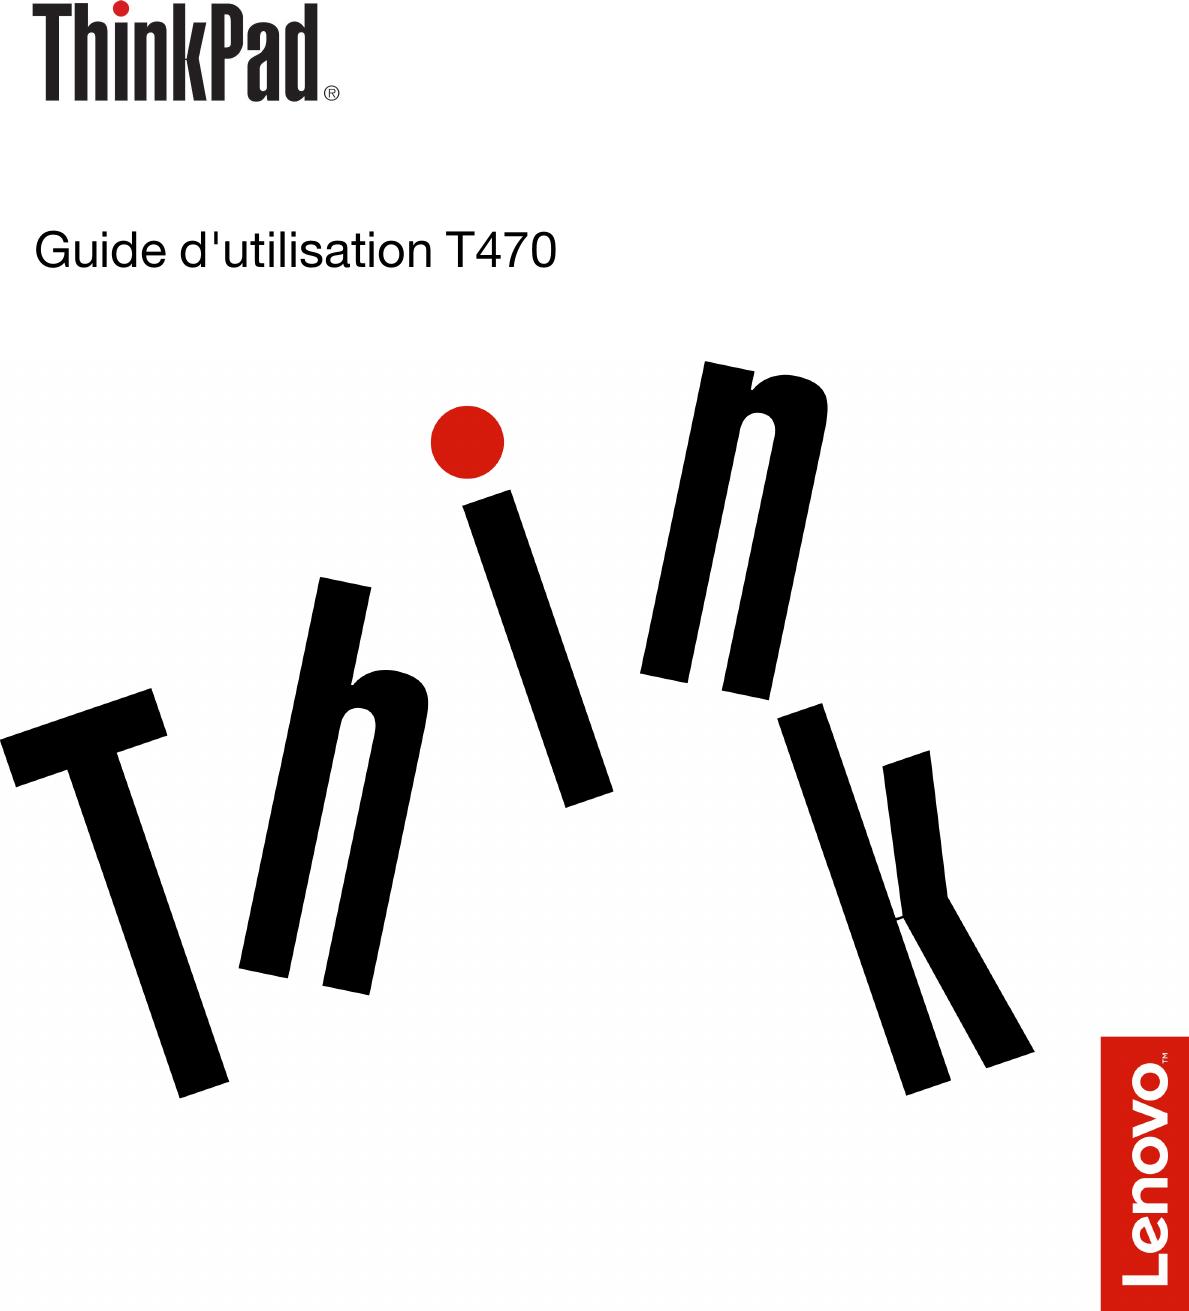 Lenovo T470 Ug Fr Guide D'utilisation User Manual (French